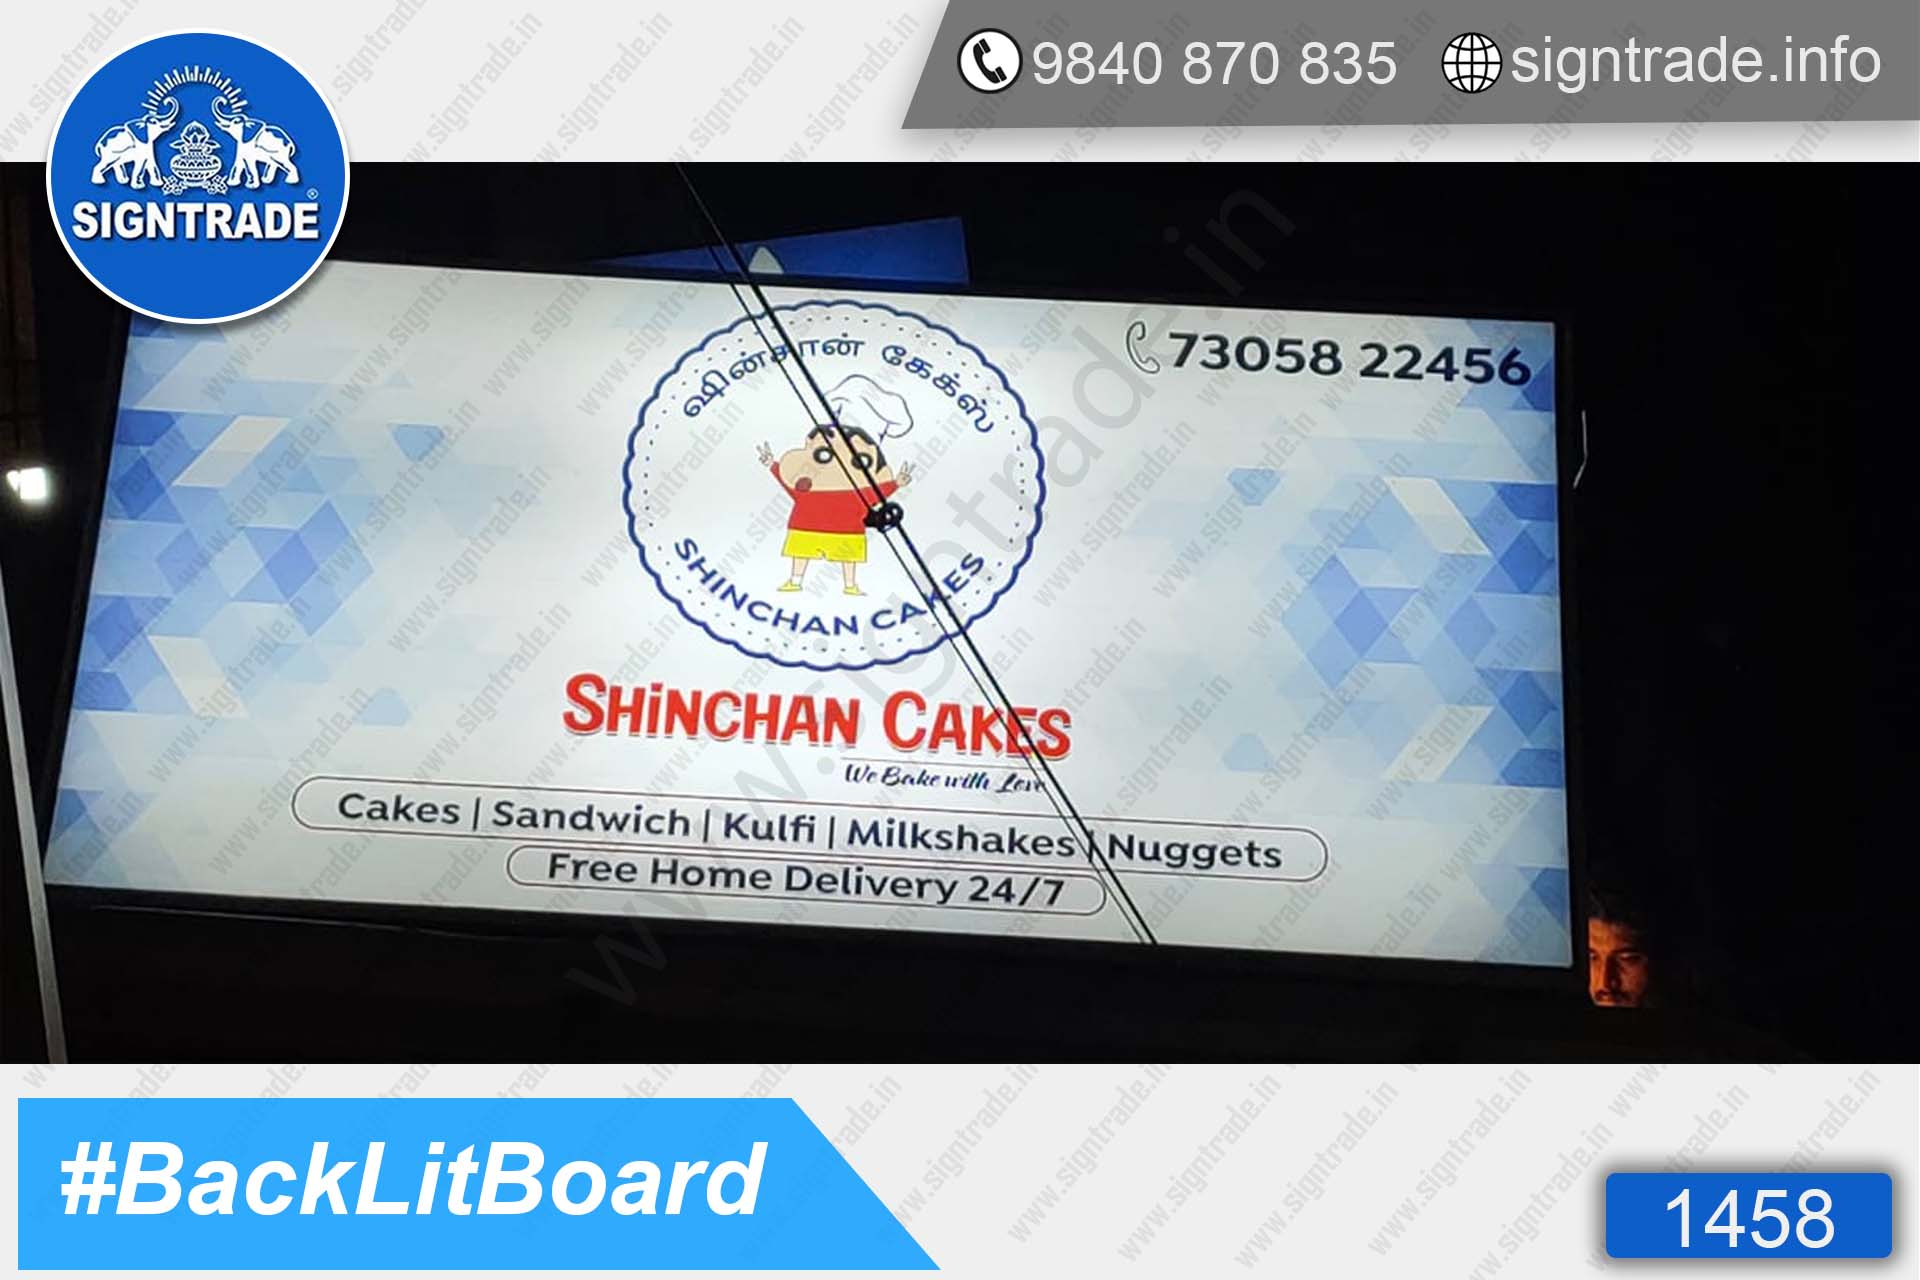 Shinchan Cakes backlit Board